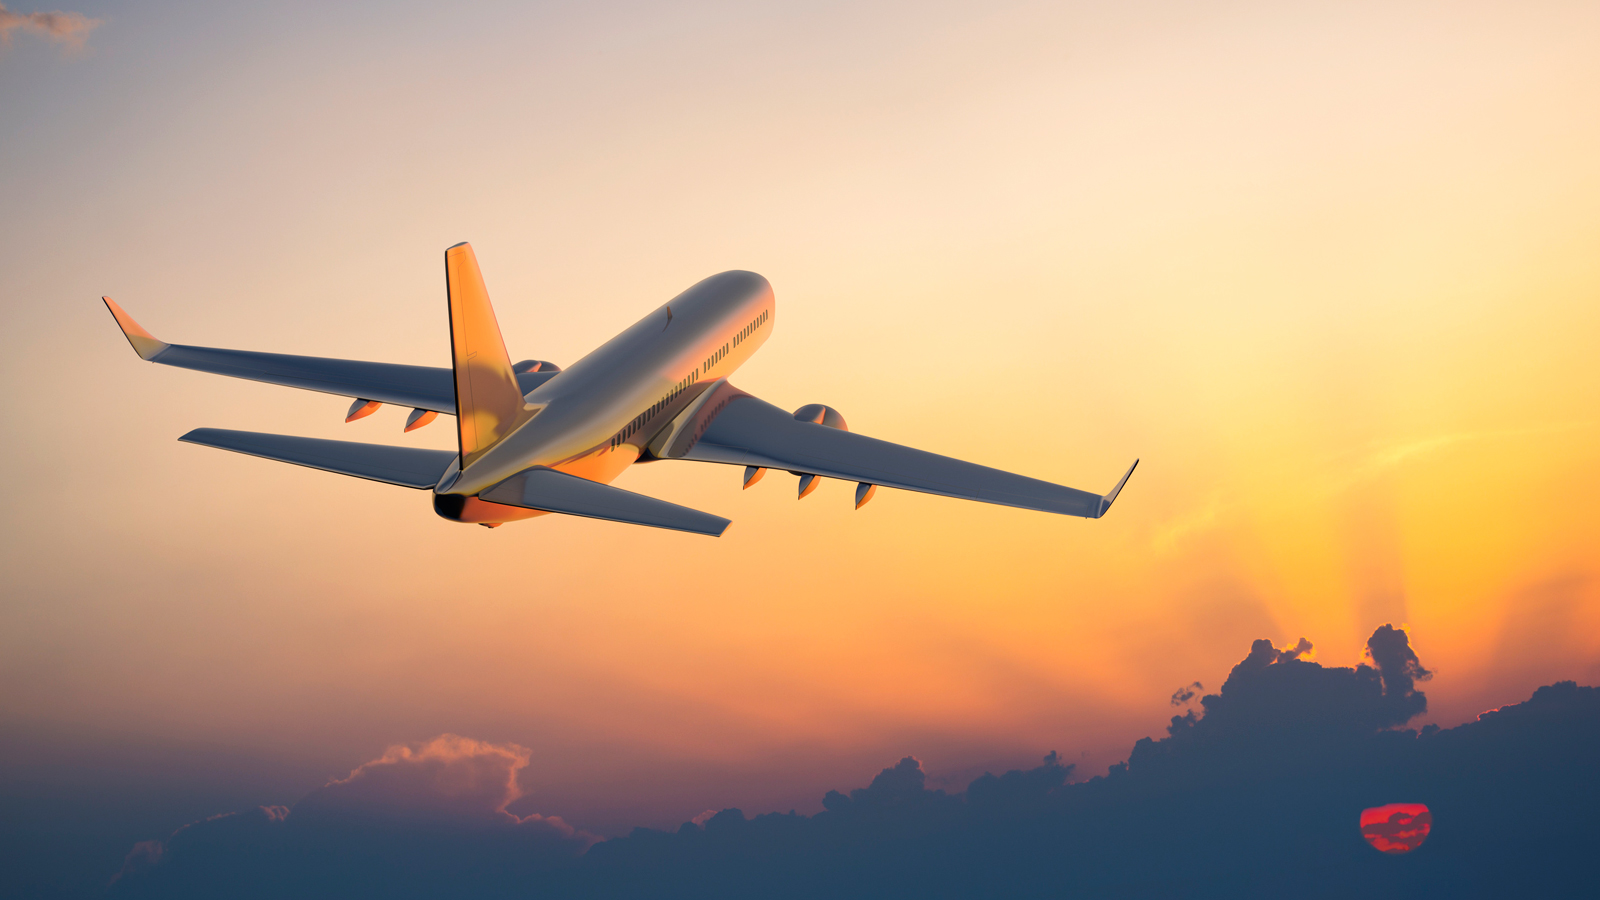 airplanetakeoff